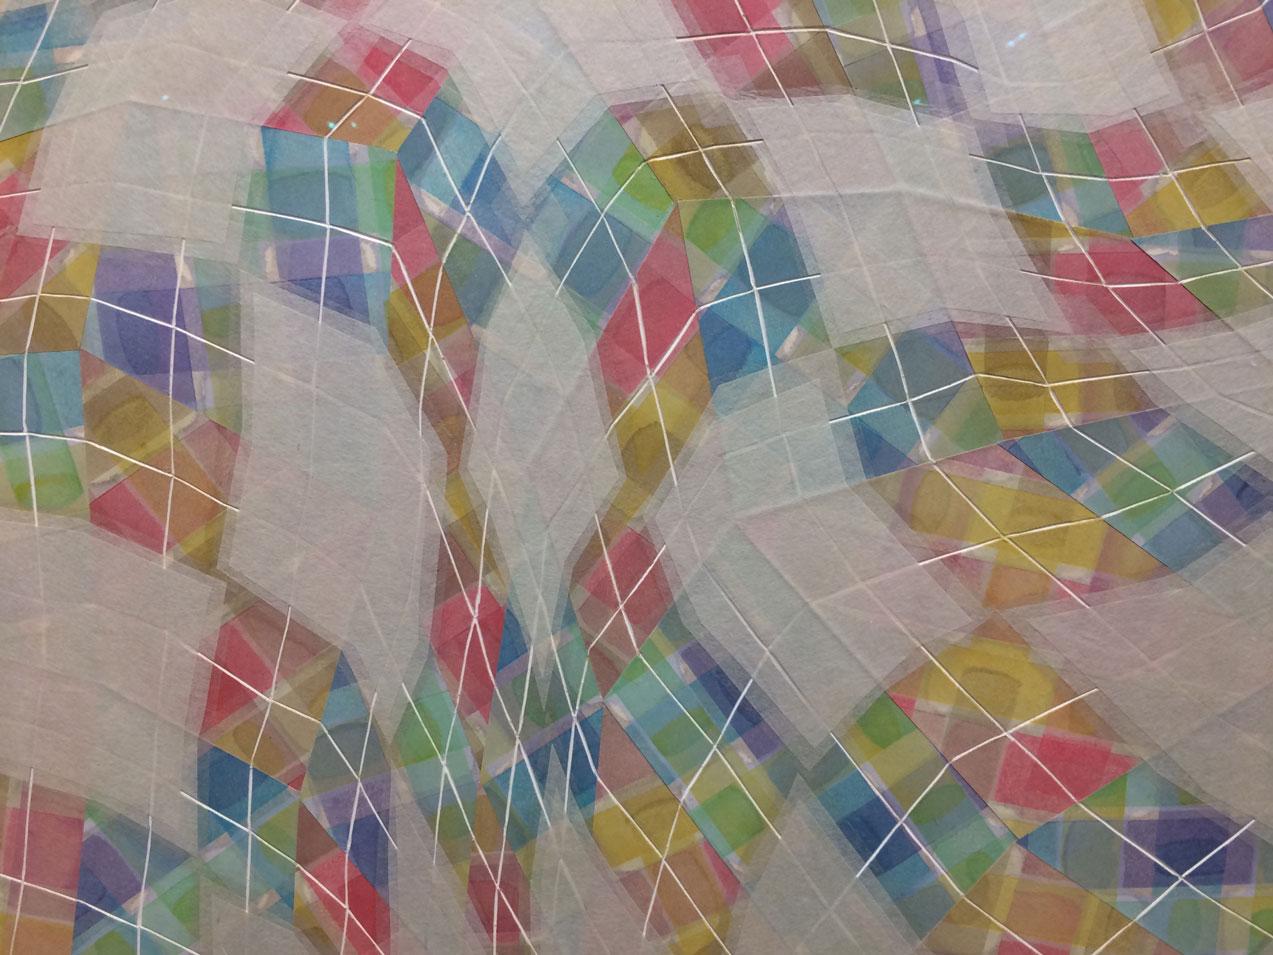 Takuji Hamanaka,  Rites of Spring , 2015, Japanese color woodcut and gampi paper collage, Owen James Gallery, Brooklyn, NY